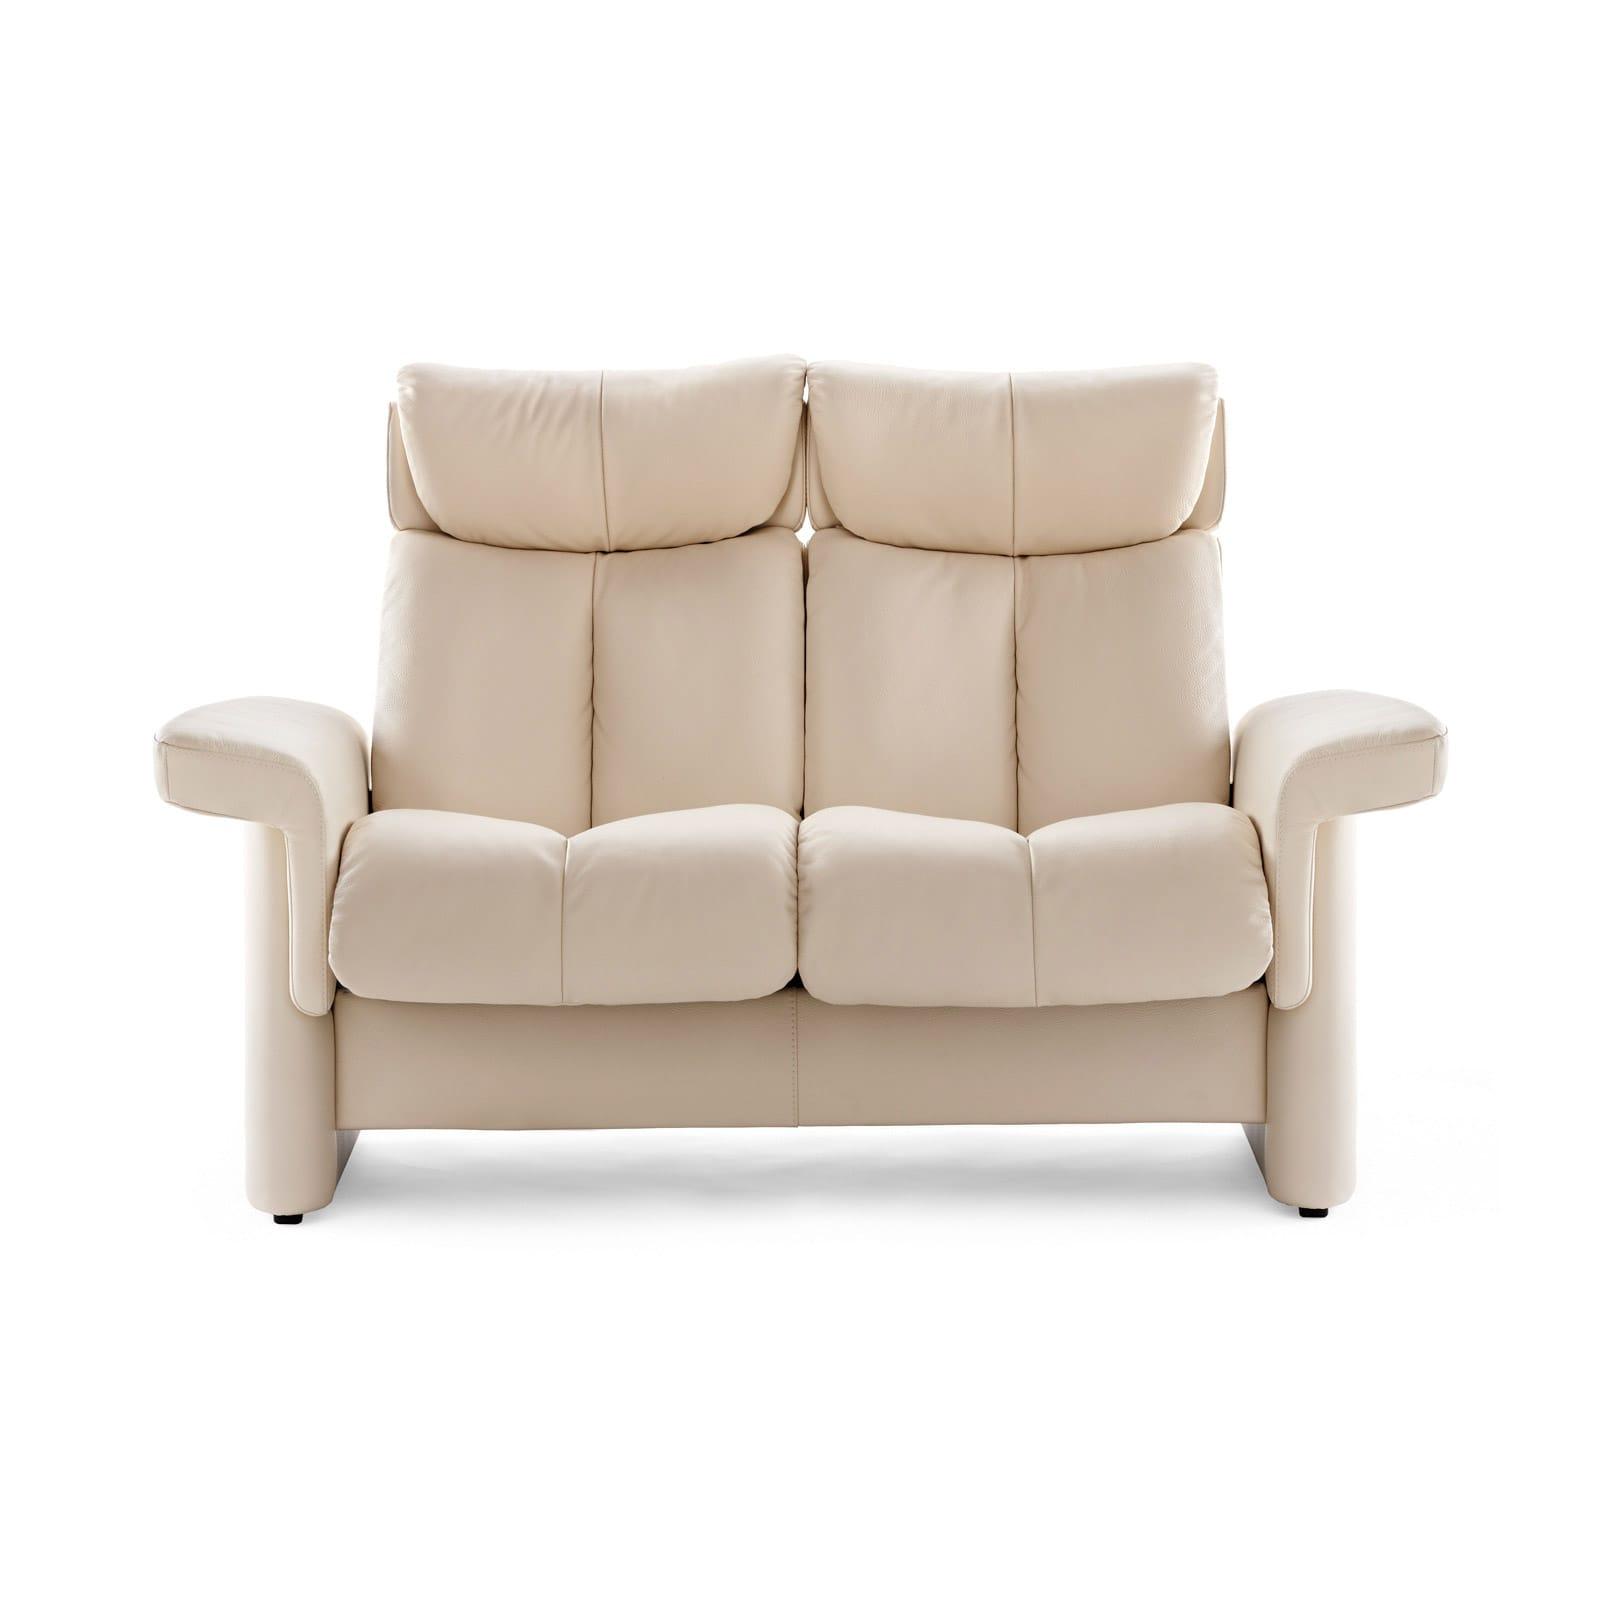 Stressless Sofa 2 Sitzer LEGEND M hoch Lederfarbe vanilla